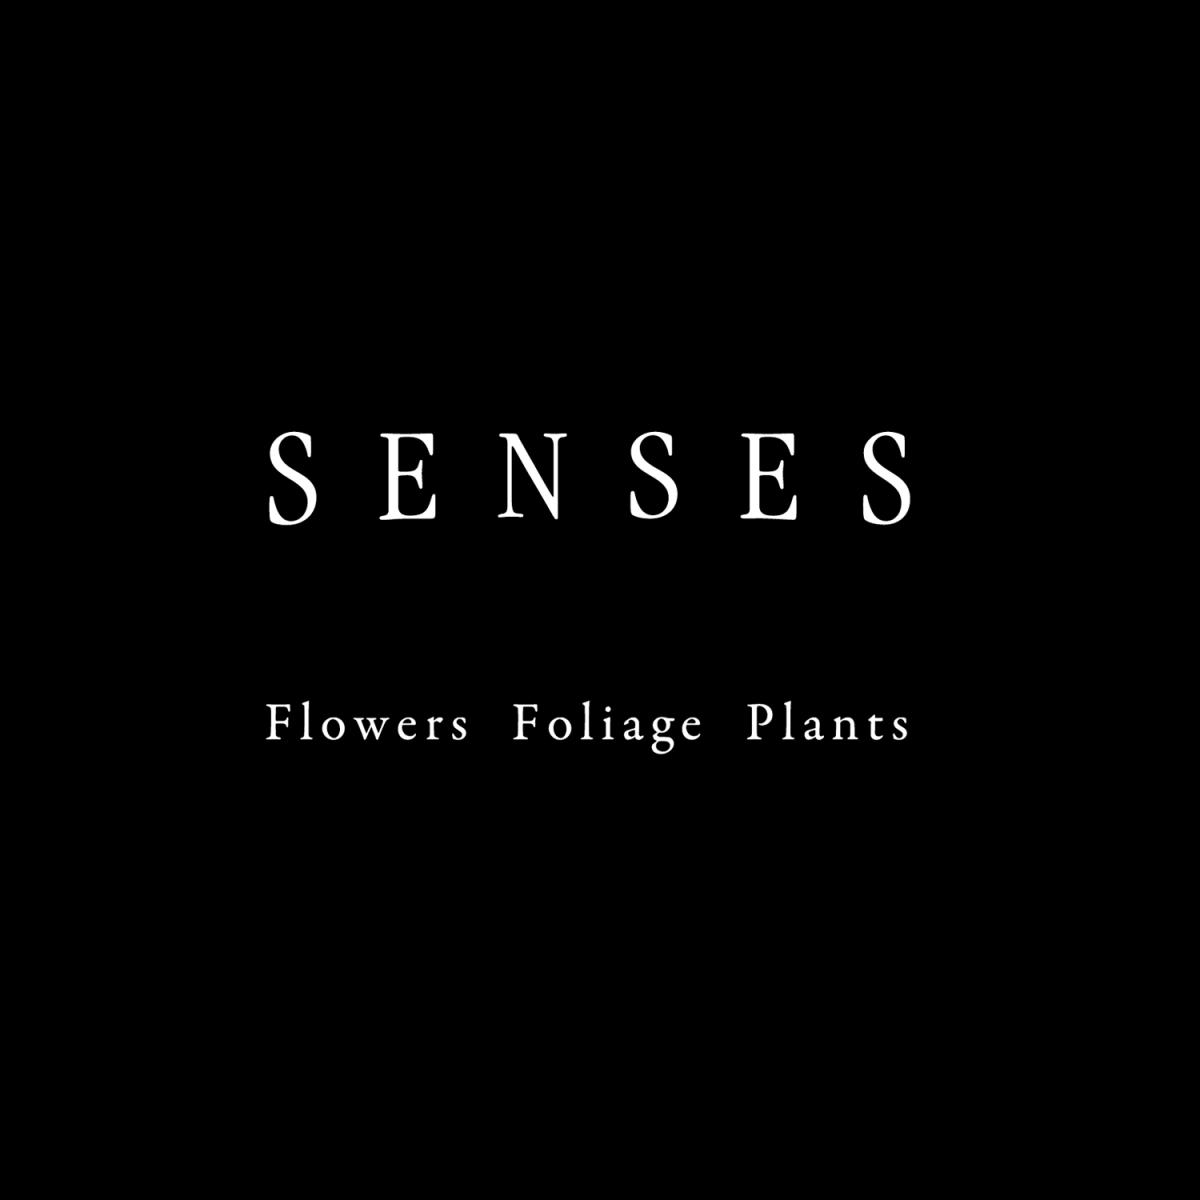 SENSES -flowers foliage plants|フラワースタジオ|CIロゴデザイン グラフィックデザイン ベーシックアプリケーション|東京都世田谷区